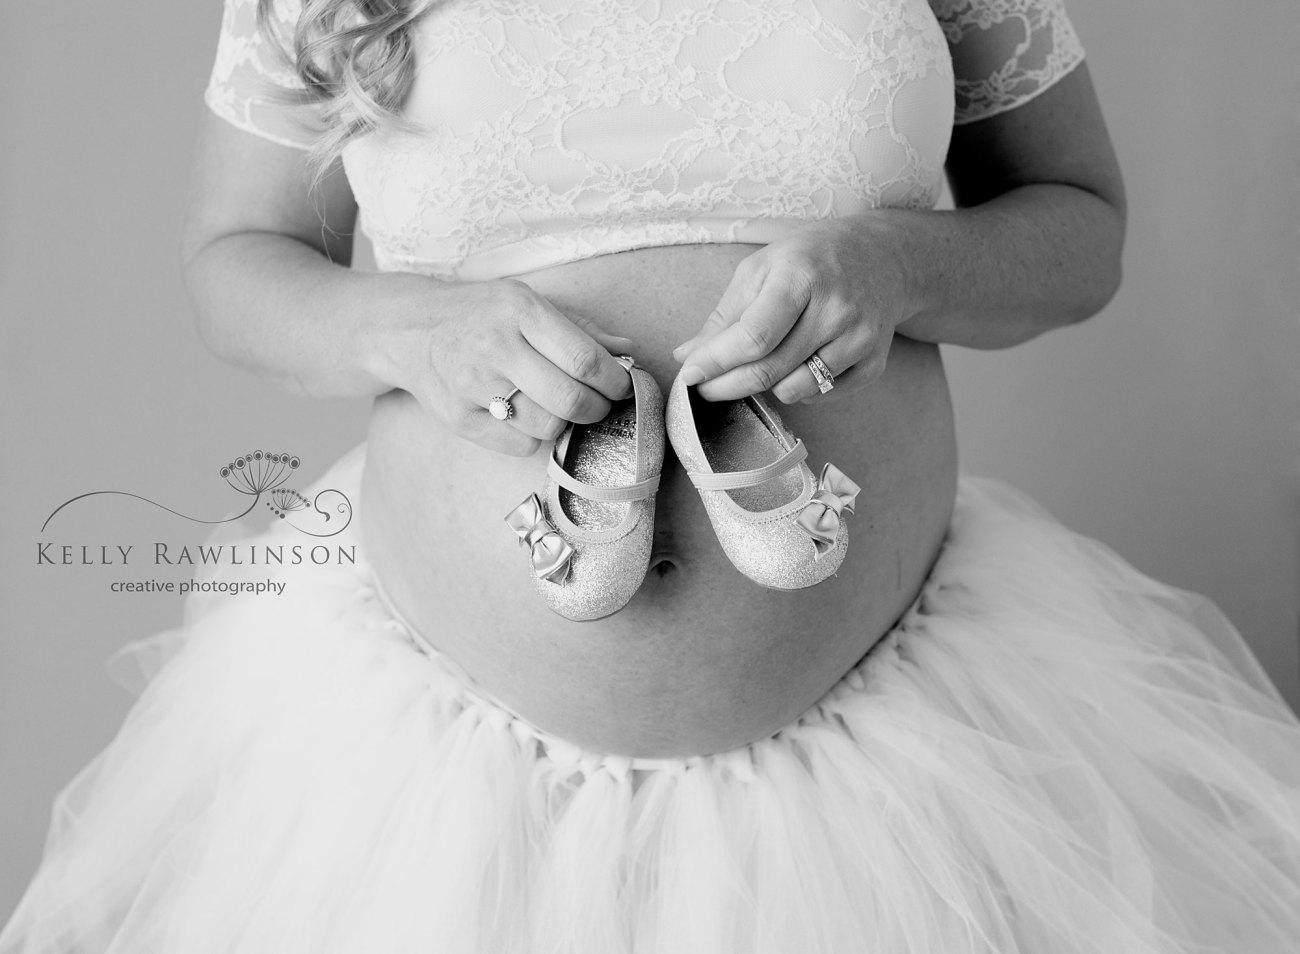 newmarket pregnancy maternity photos pictures portraits photographs